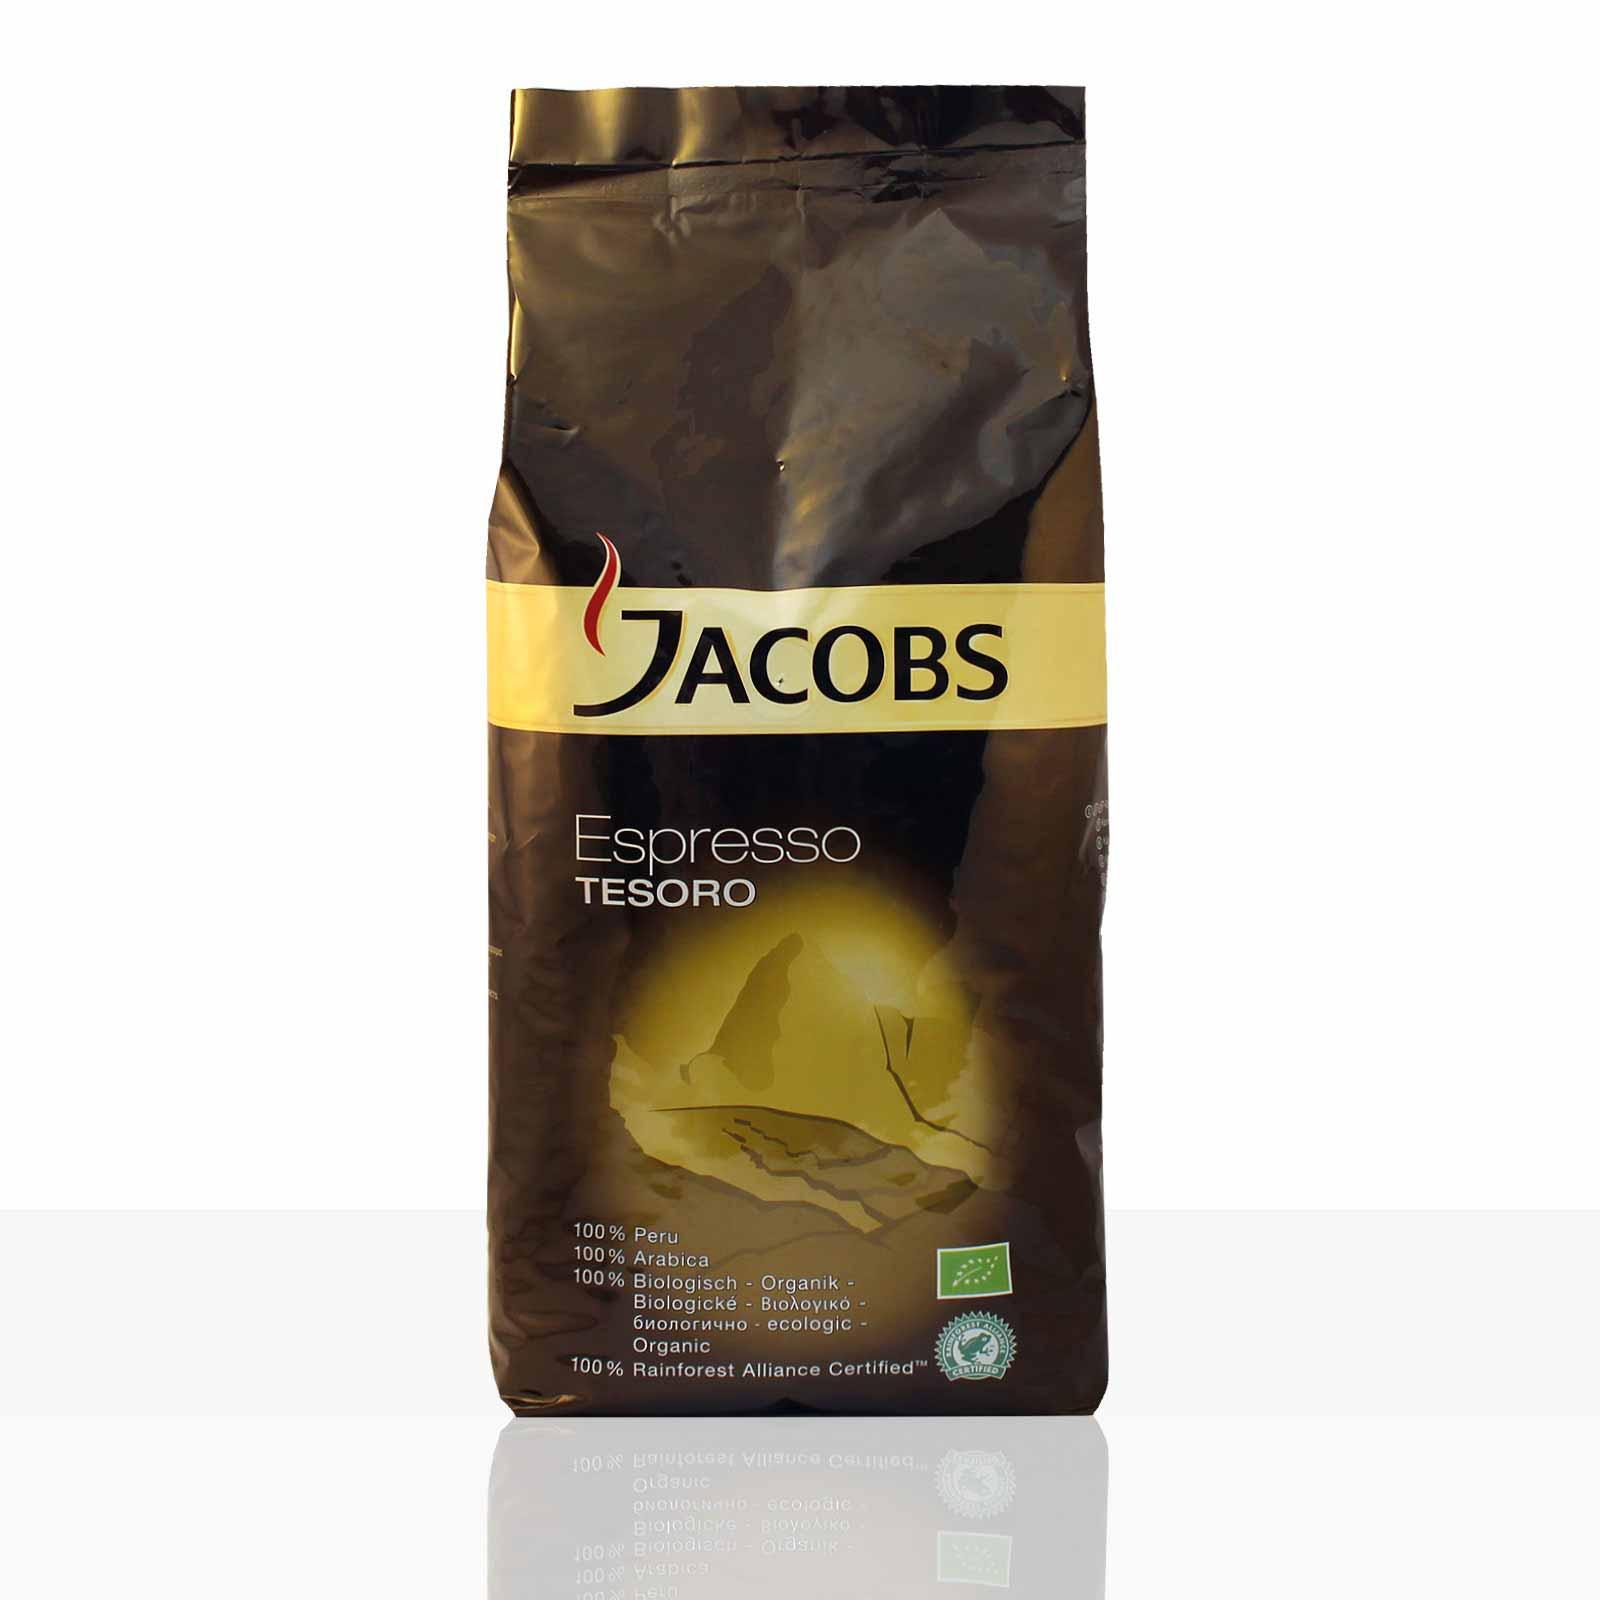 Jacobs Tesoro Espresso Peru - 8 x 1kg ganze Bio Kaffee-Bohnen, 100% Arabica